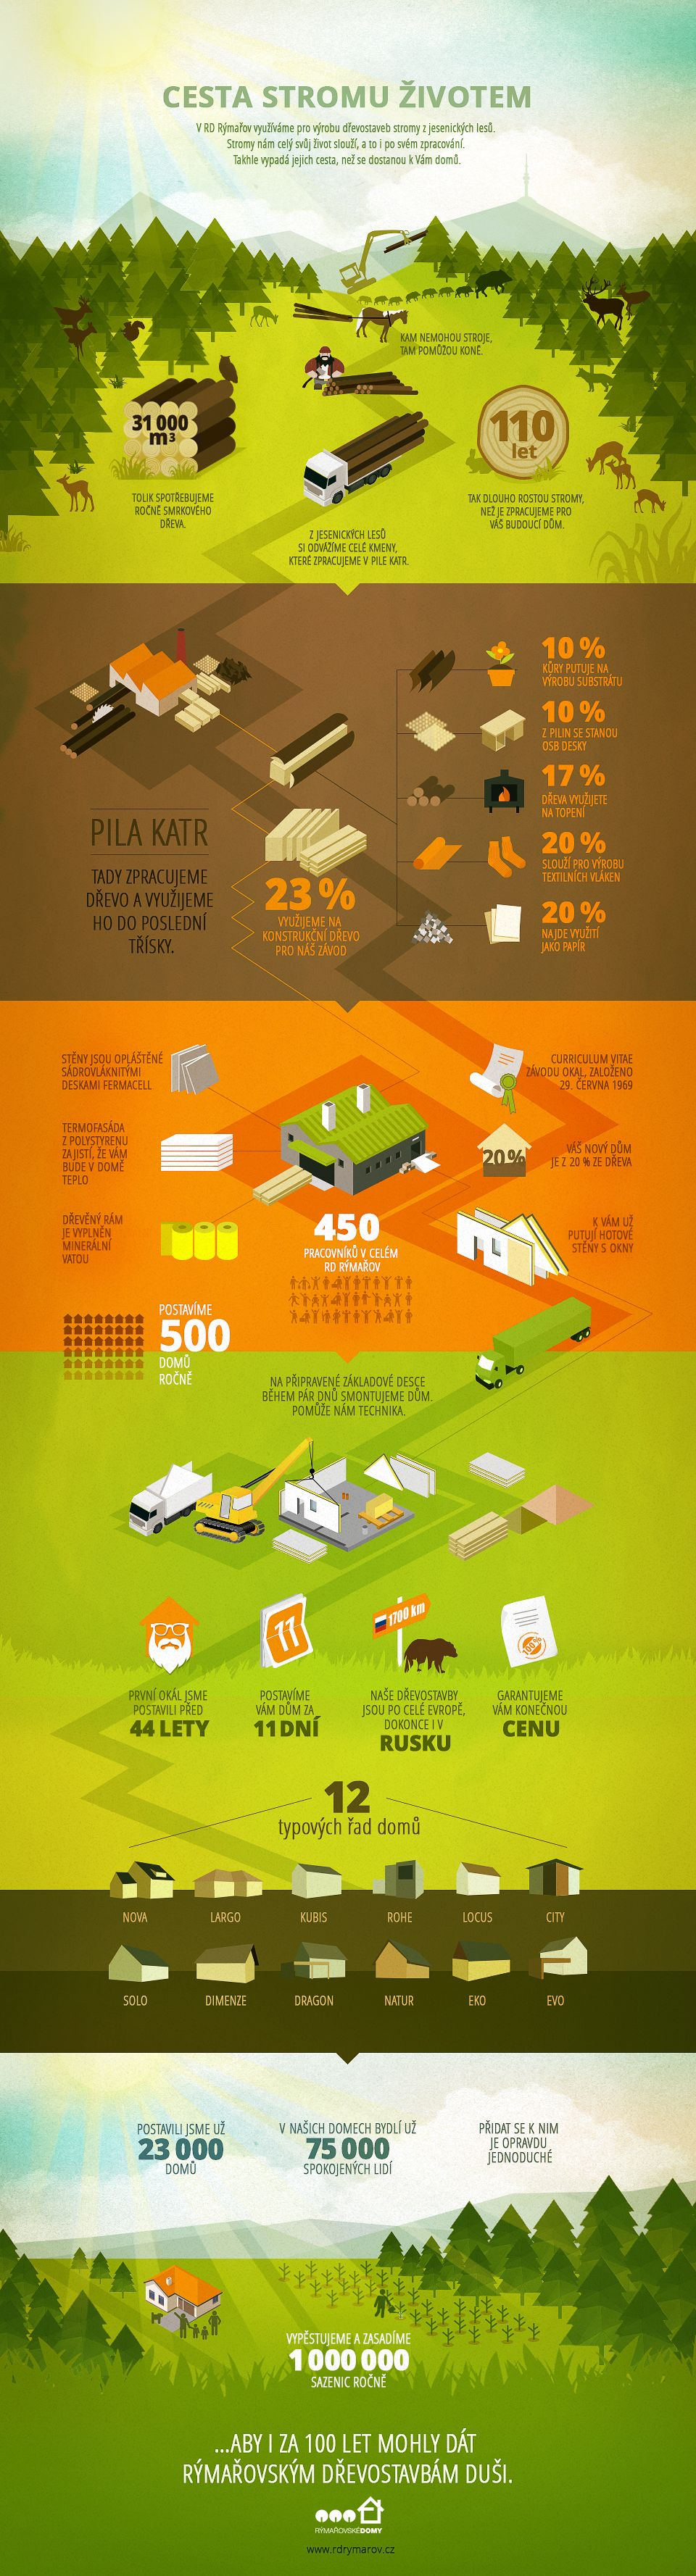 Cesta stromu životem (infografika RD Rýmařov)